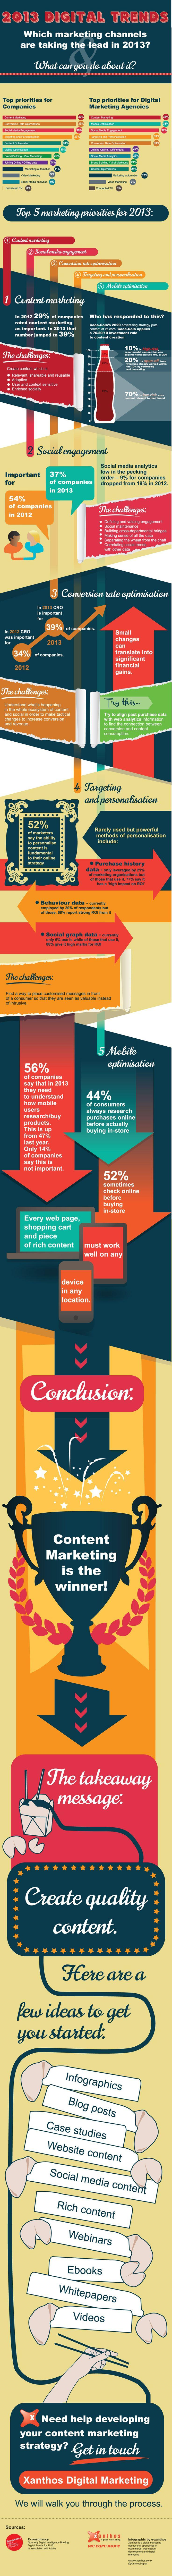 2013 digital marketing trends. #infographic #marketing #digital